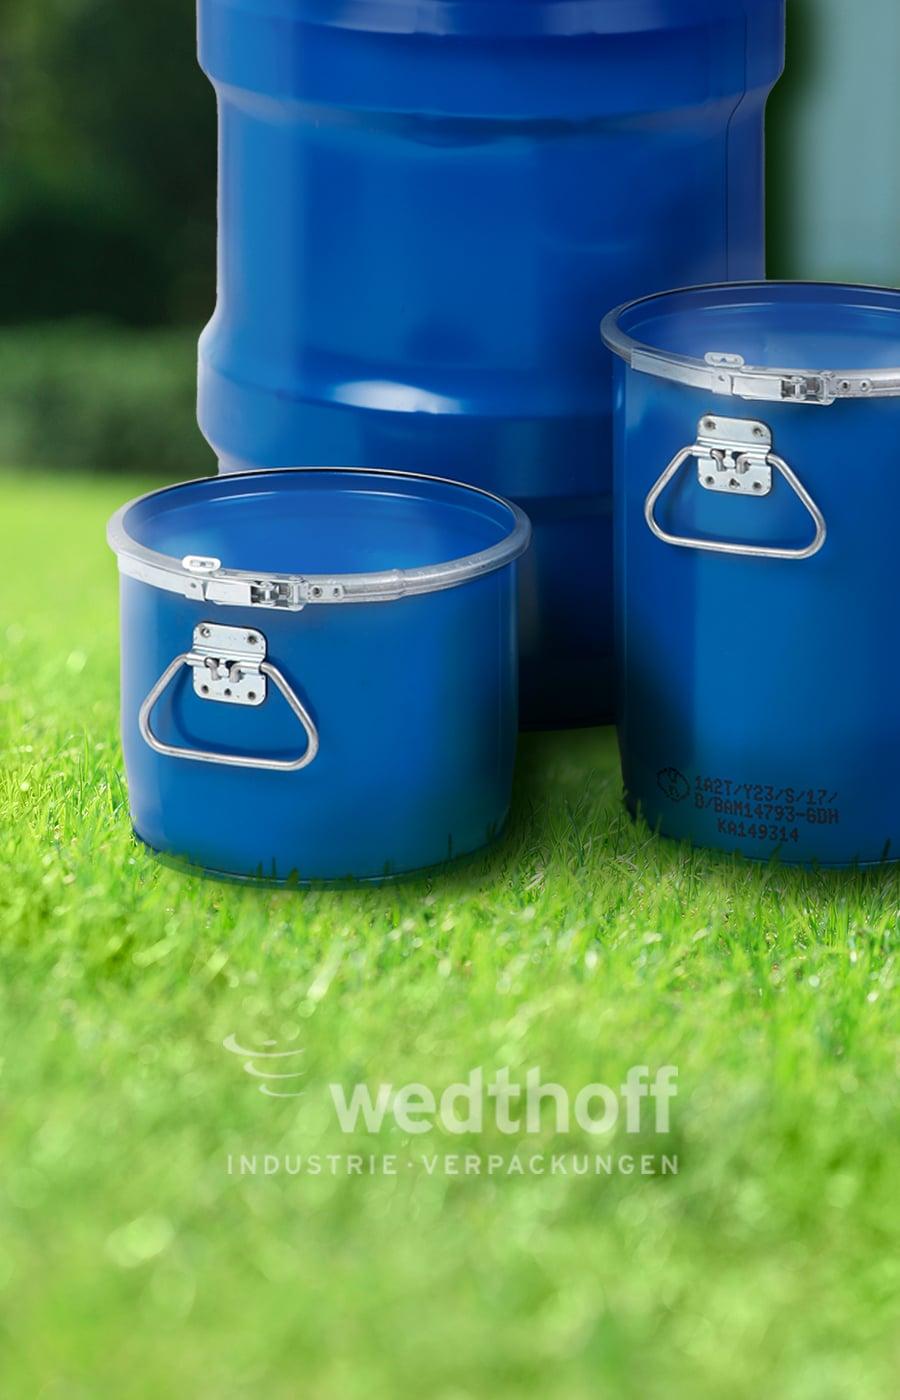 April April – Bergungsverpackungen die sich selbstständig vermehren by WEDTHOFF Industrieverpackungen 6l - 12l - 60l - 123l. Industrieverpackungen NRW